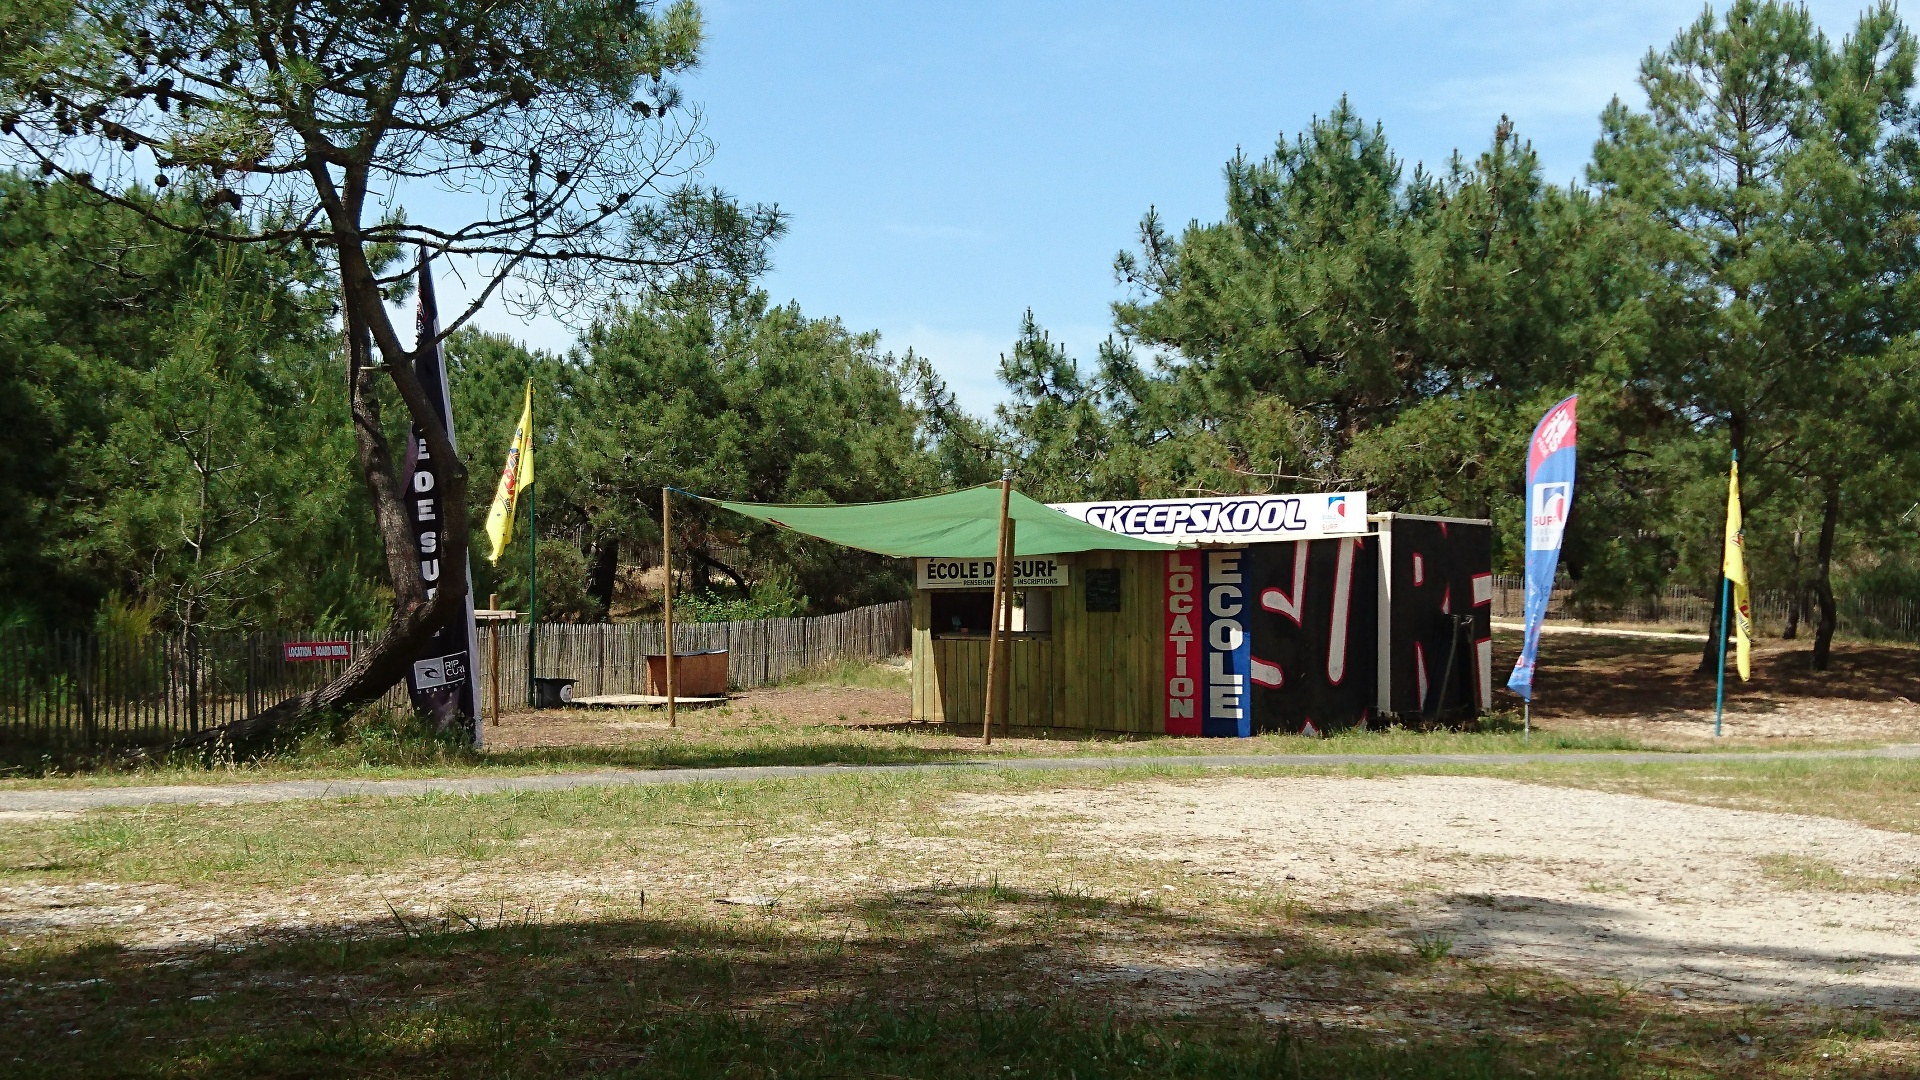 Ecole de surf Skeepskool